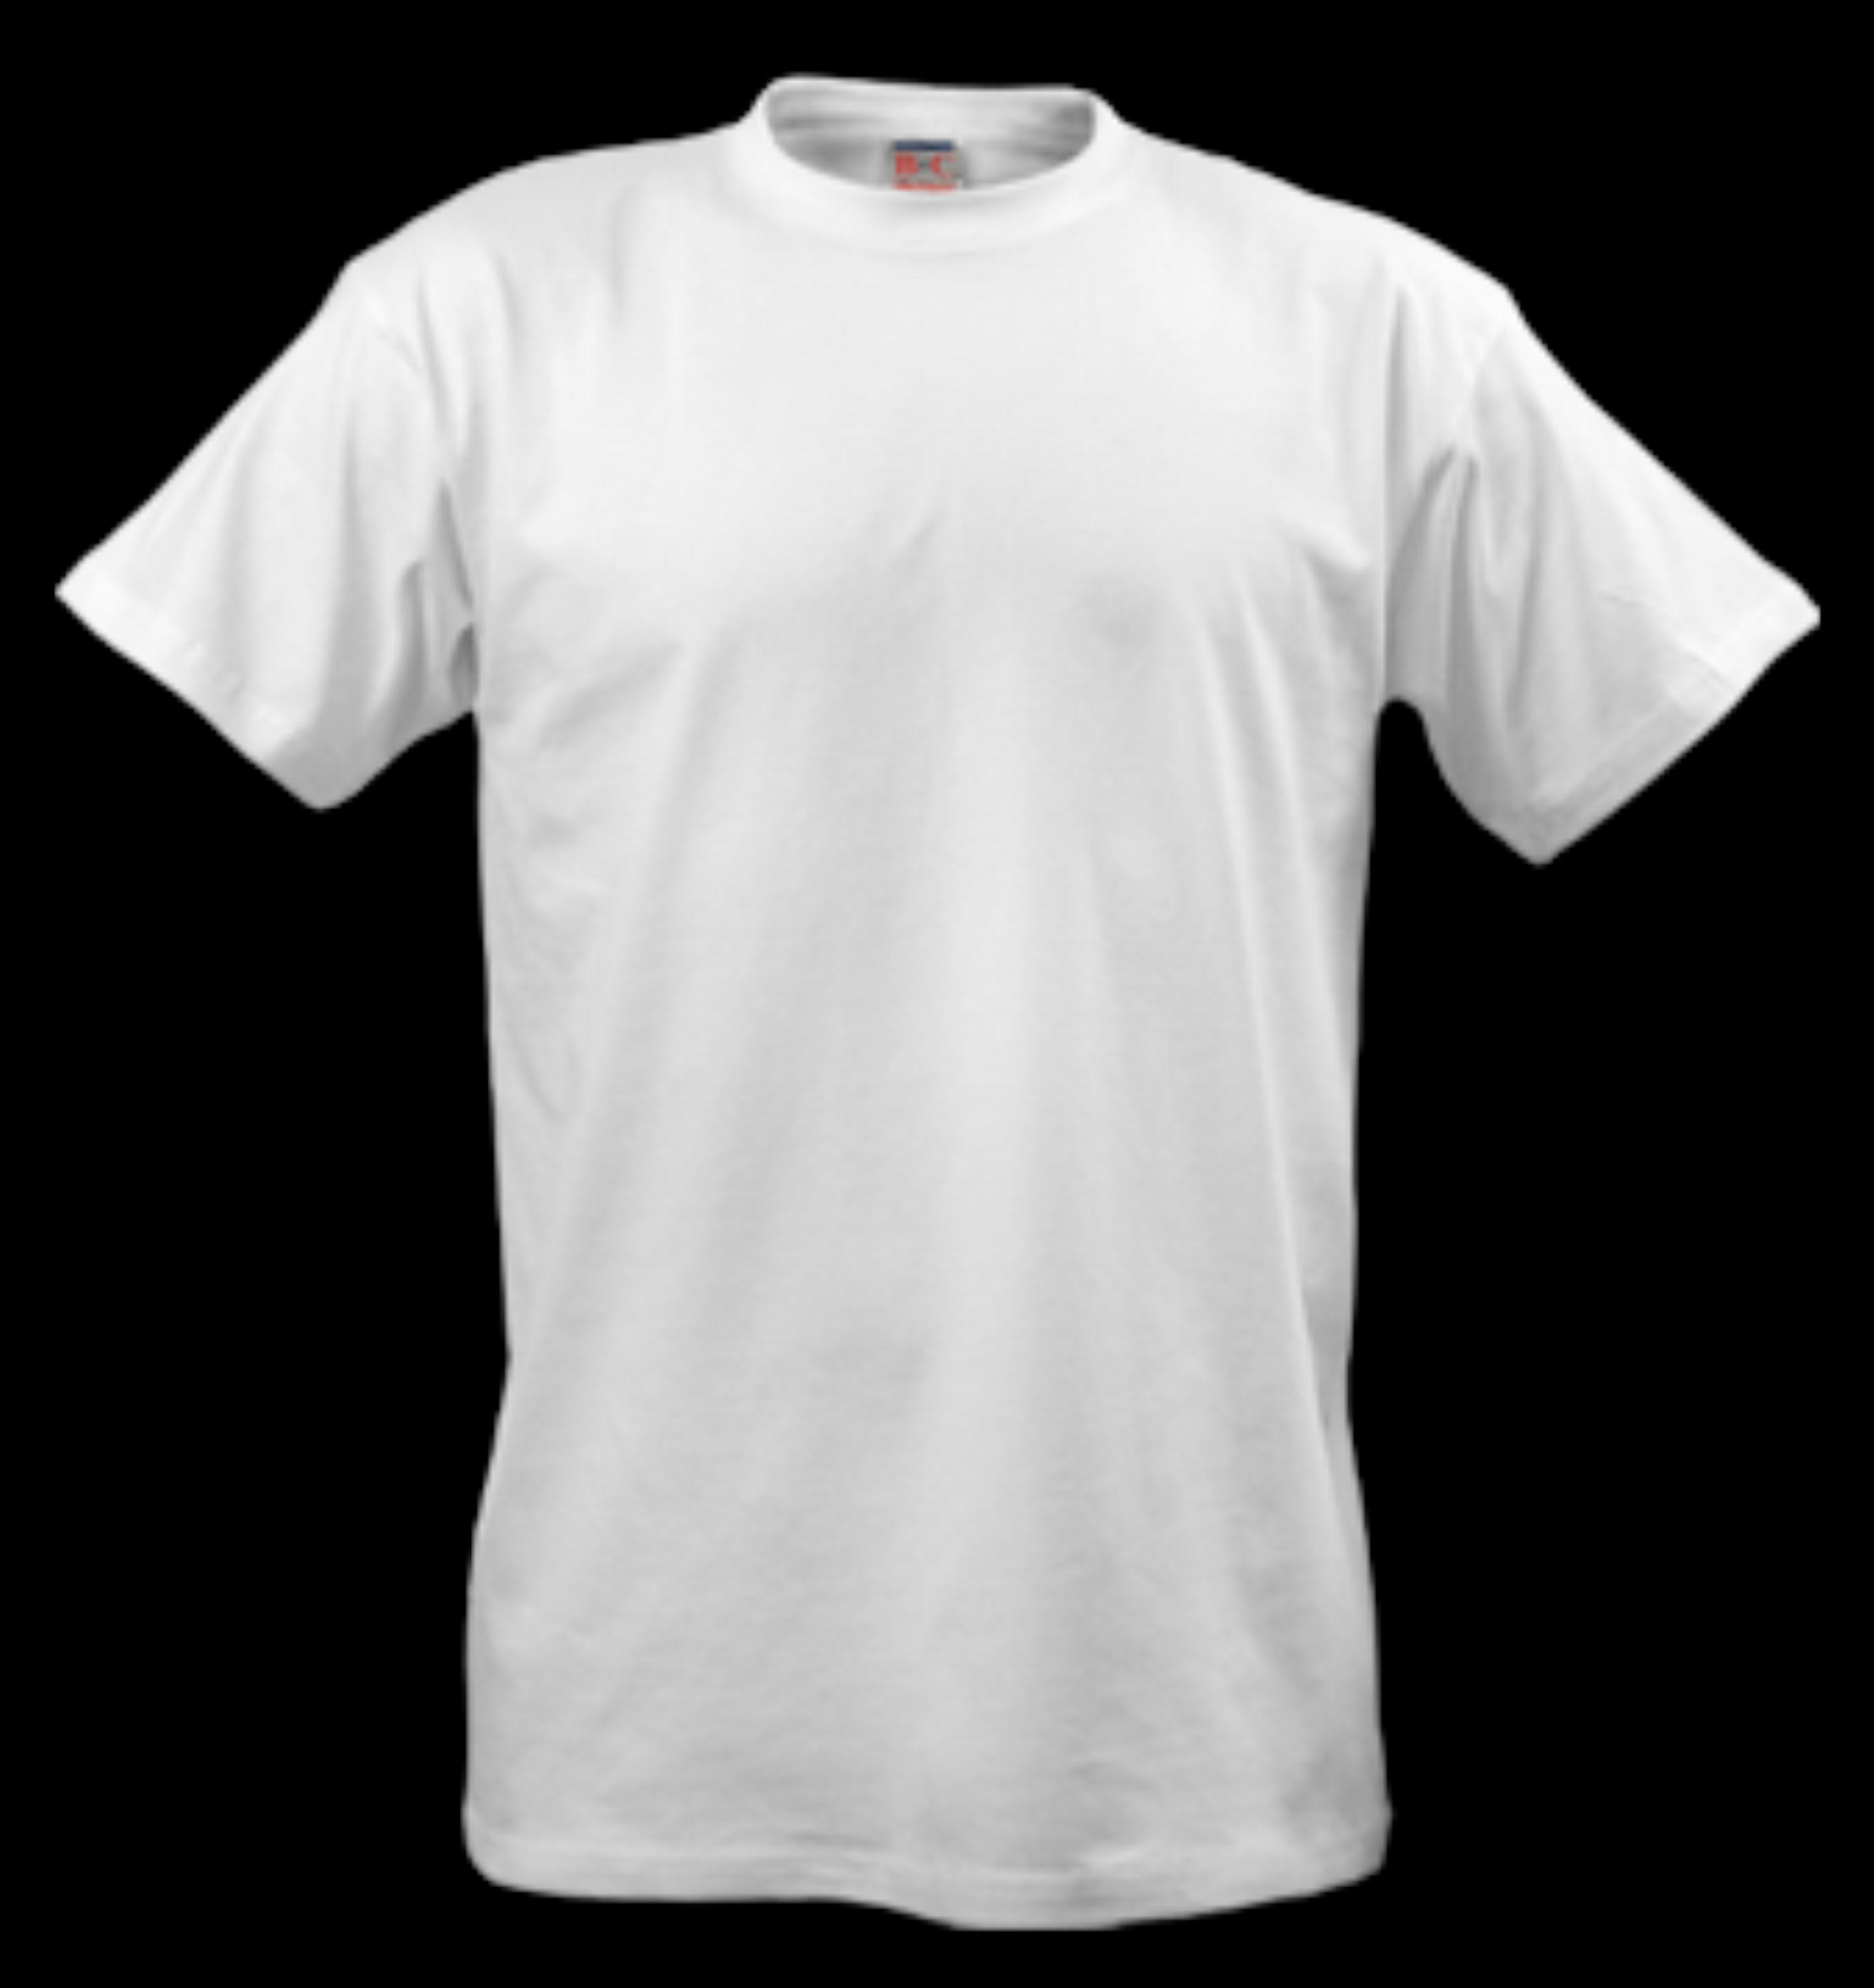 White T Shirt T Shirt Png No Background.